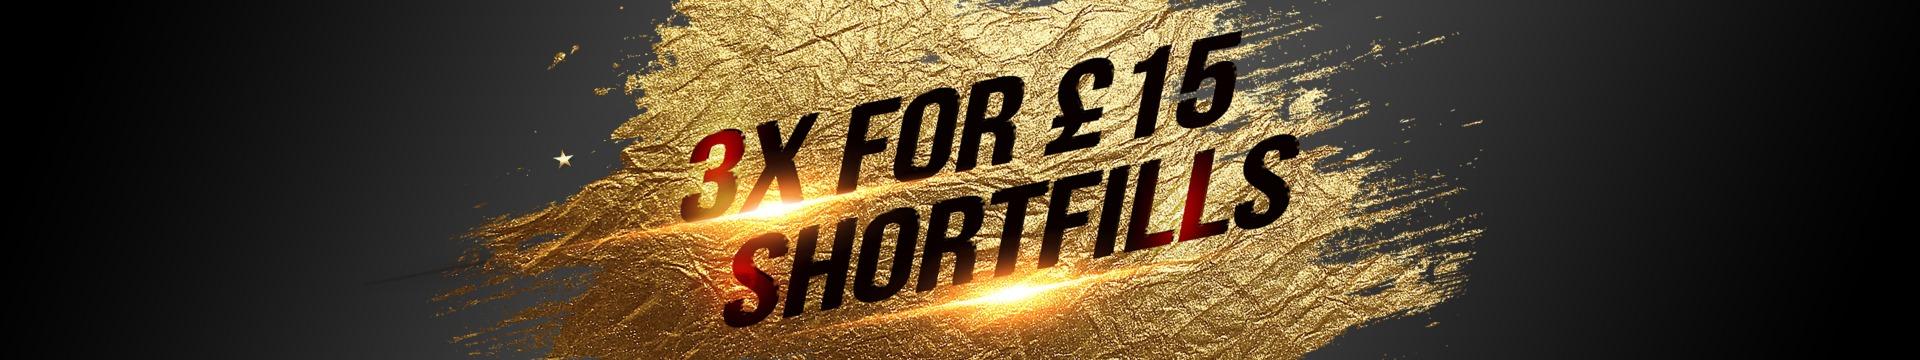 3x For £15 Shortfills